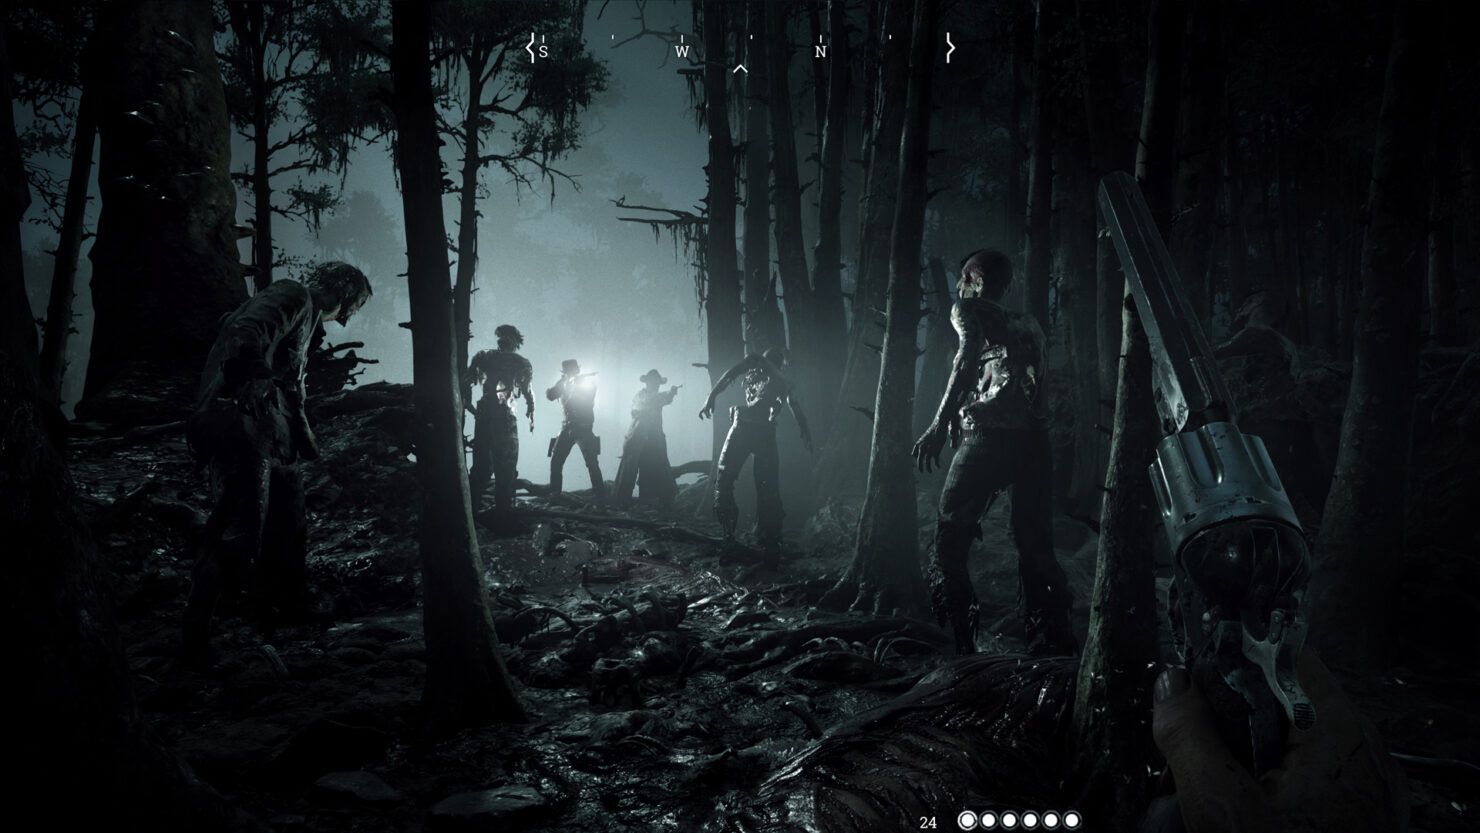 hunt_screenshot_light_1080p